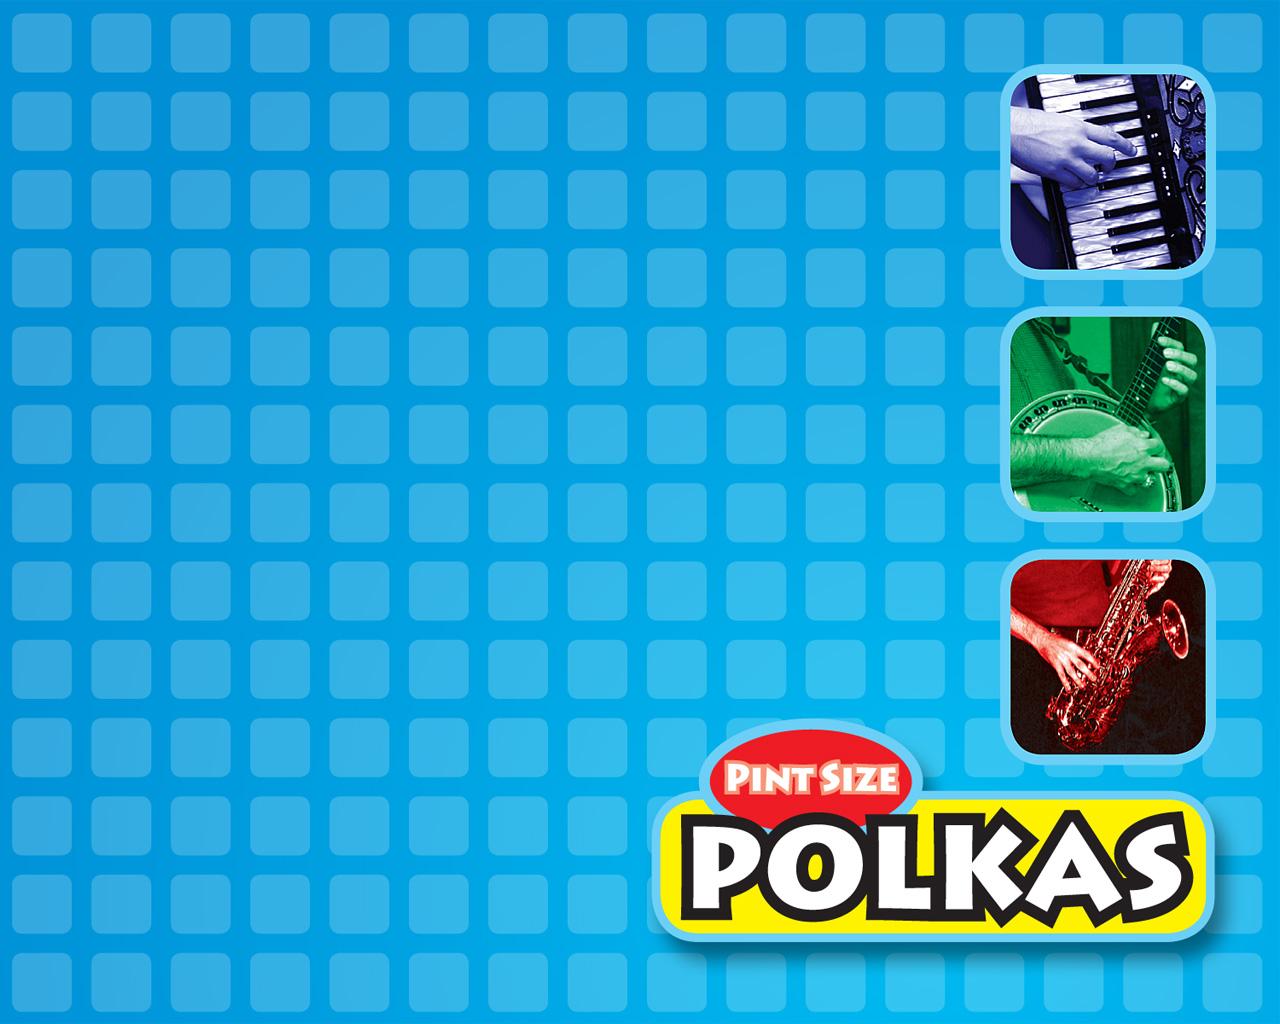 pint size polka wallpaper wallpaper 02 1280x1024